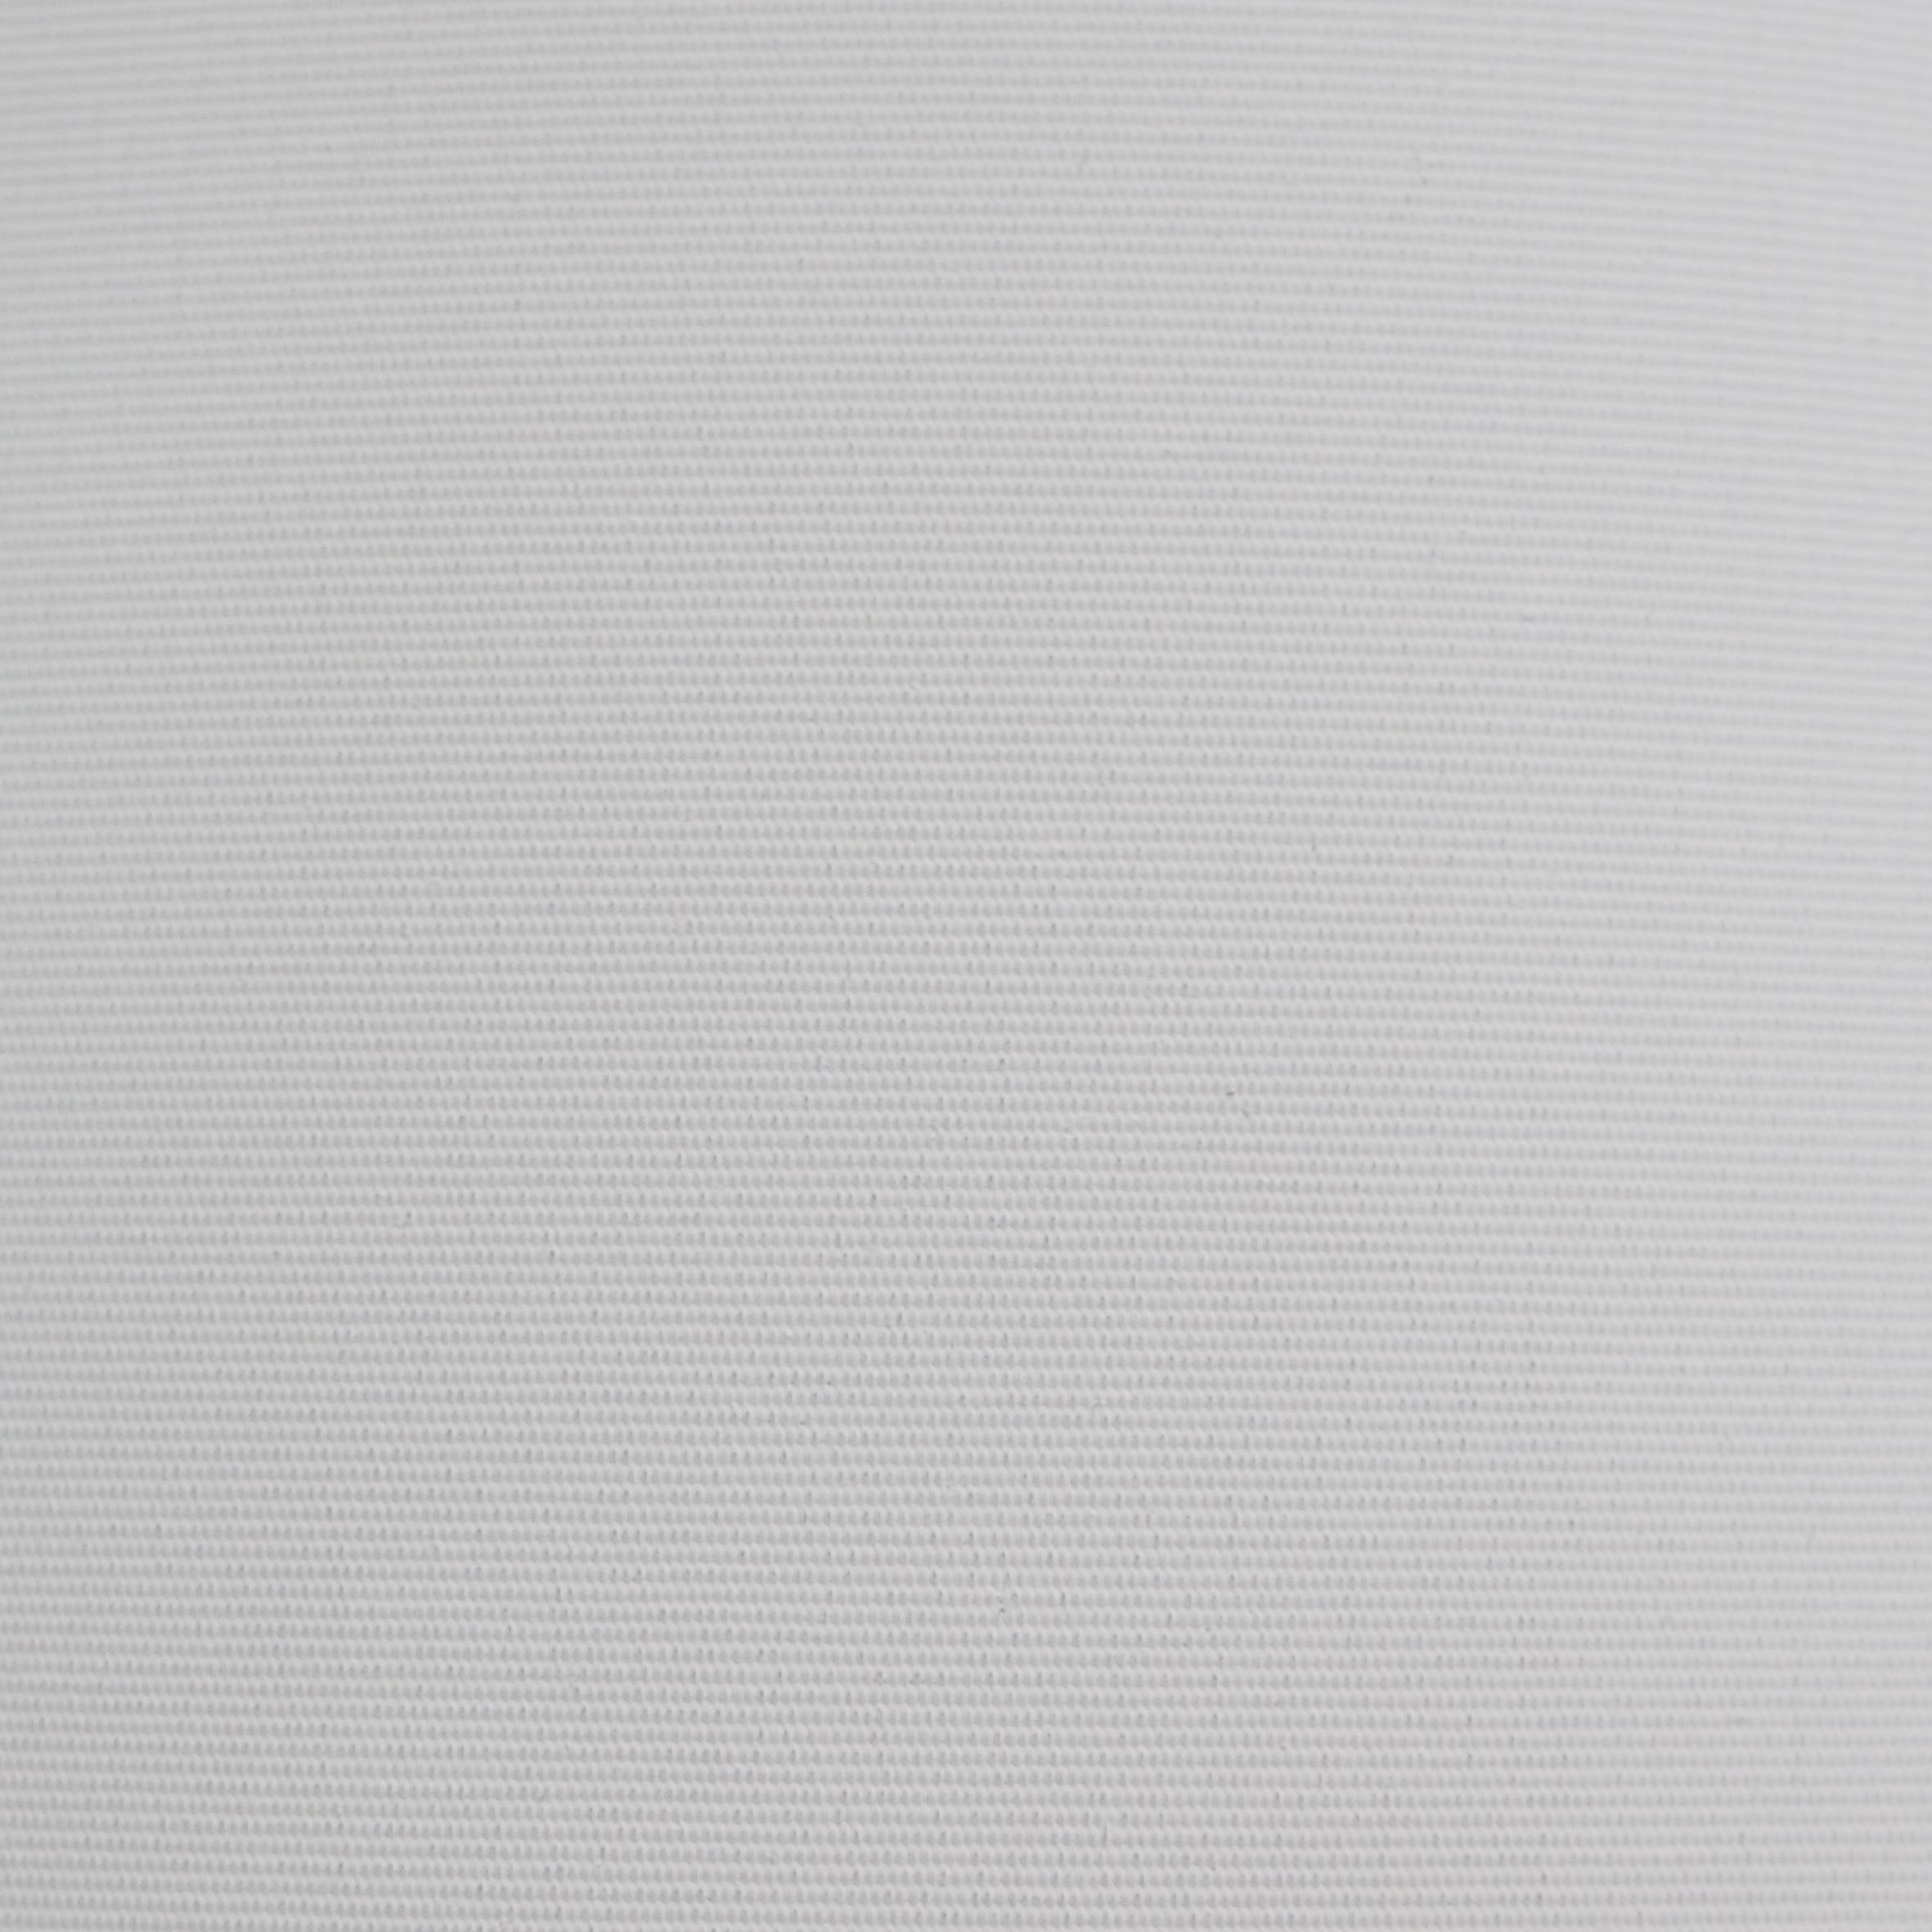 Berke-White